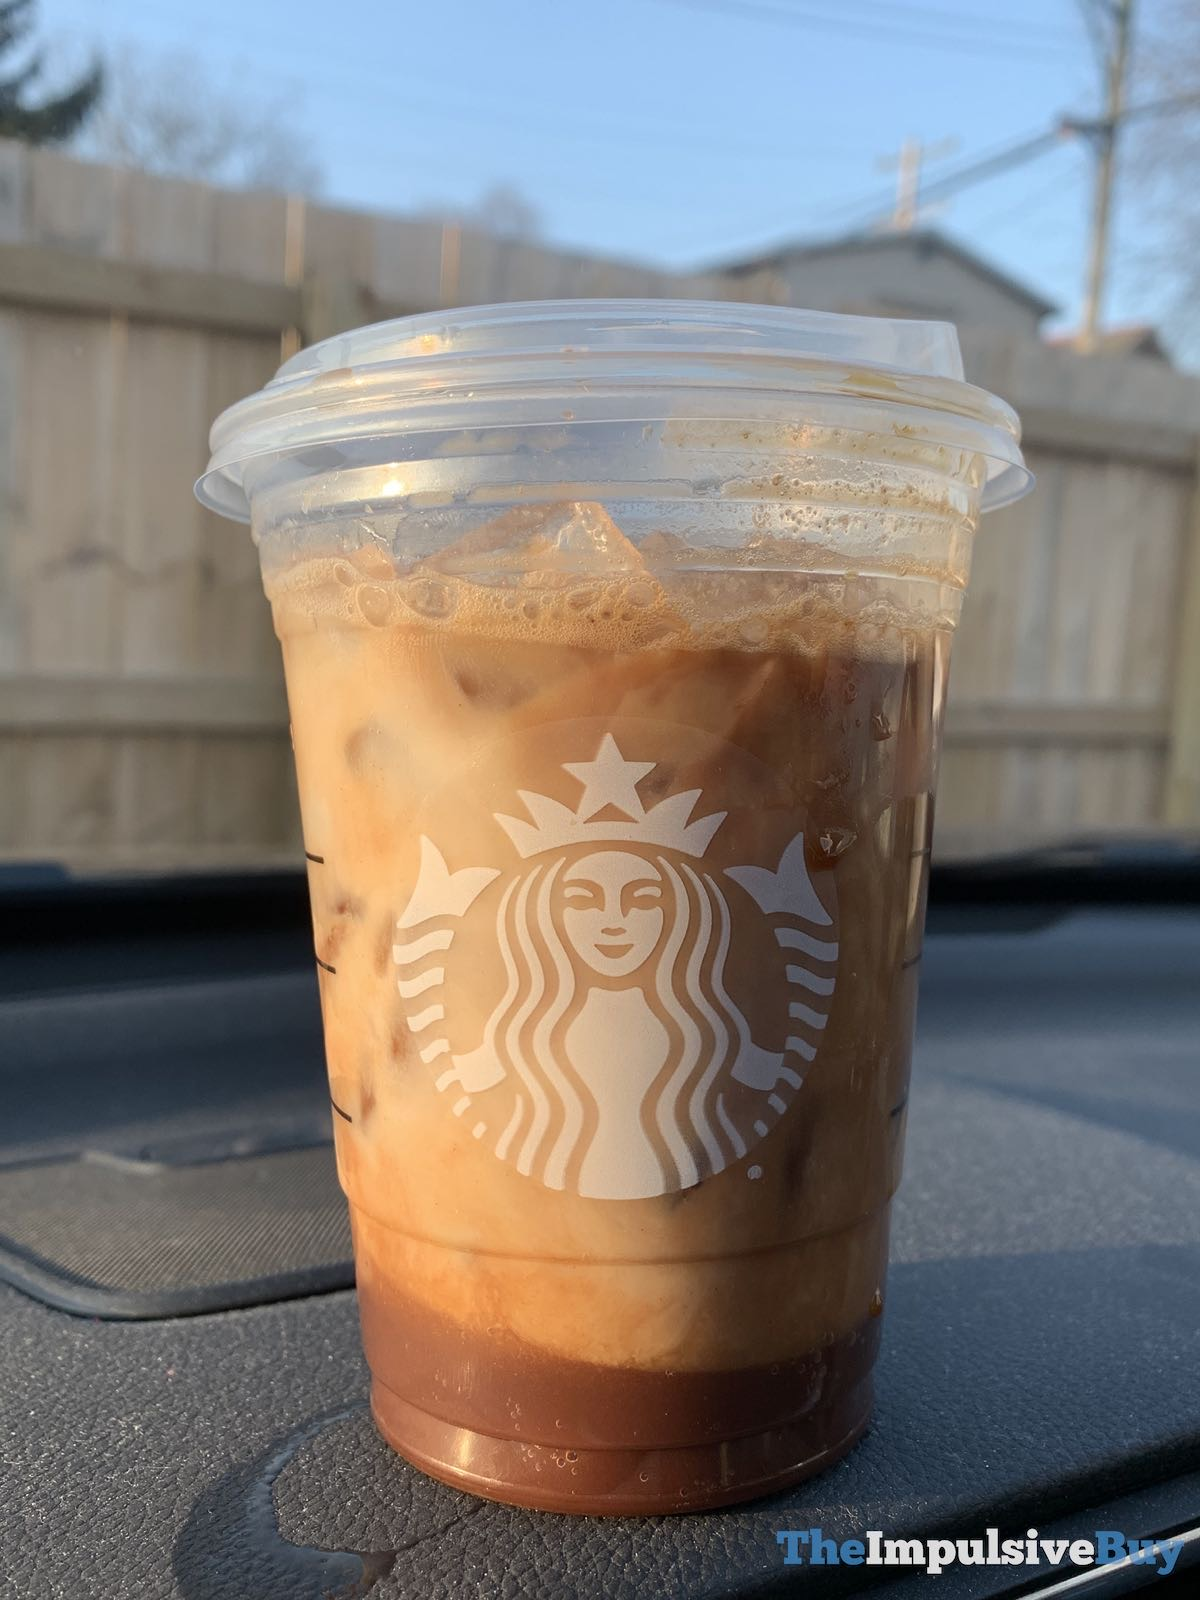 REVIEW: Starbucks Iced Chocolate Almondmilk Shaken Espresso - The Impulsive Buy